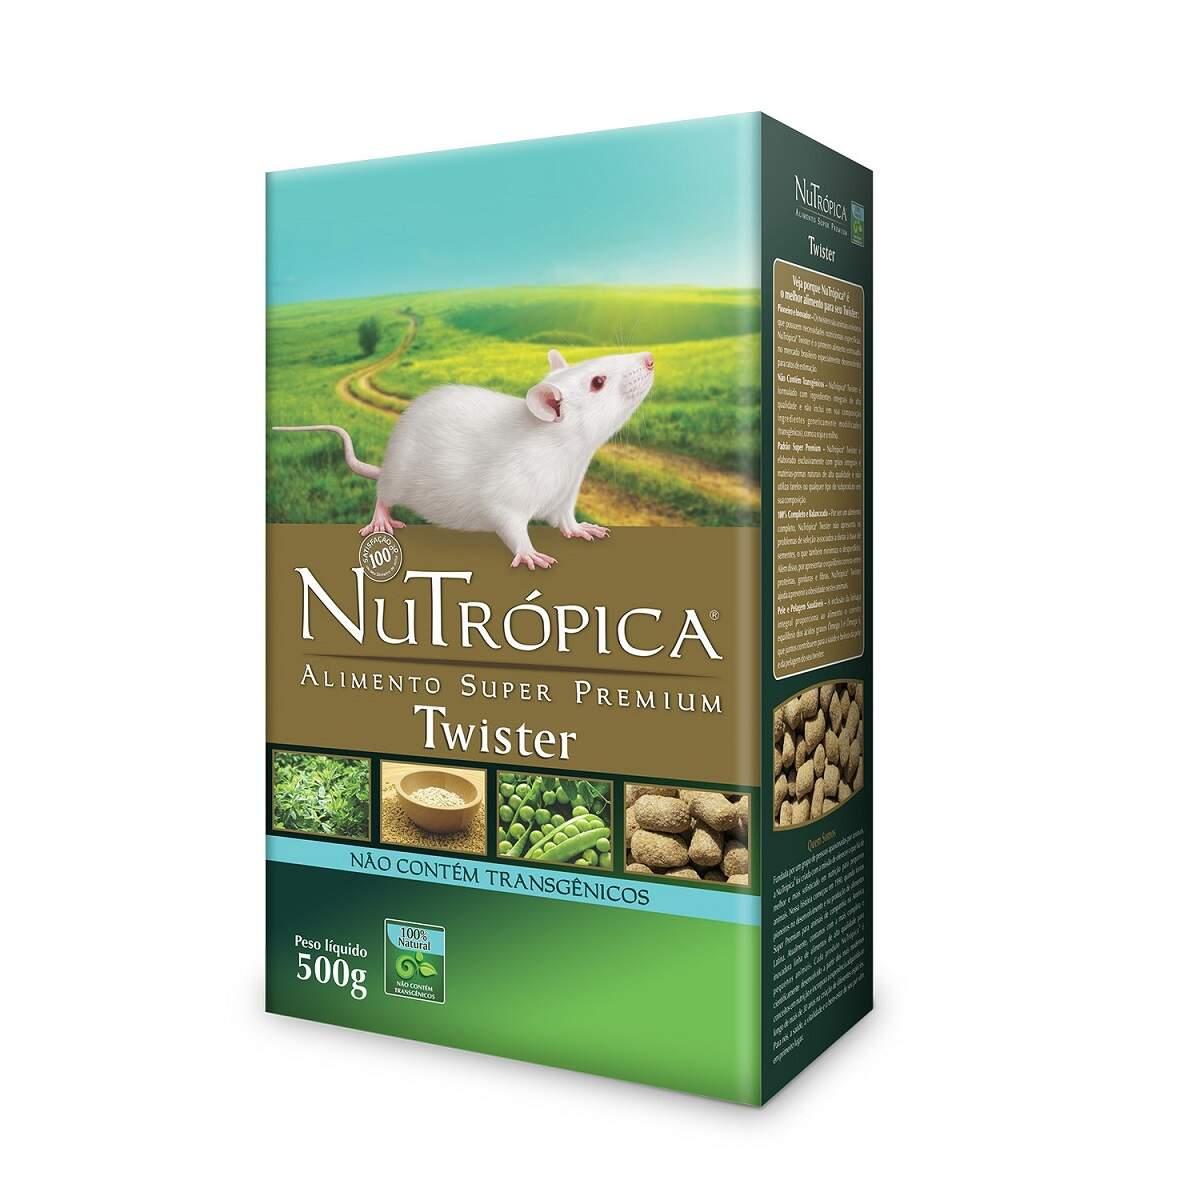 NUTRÓPICA TWISTER 500g